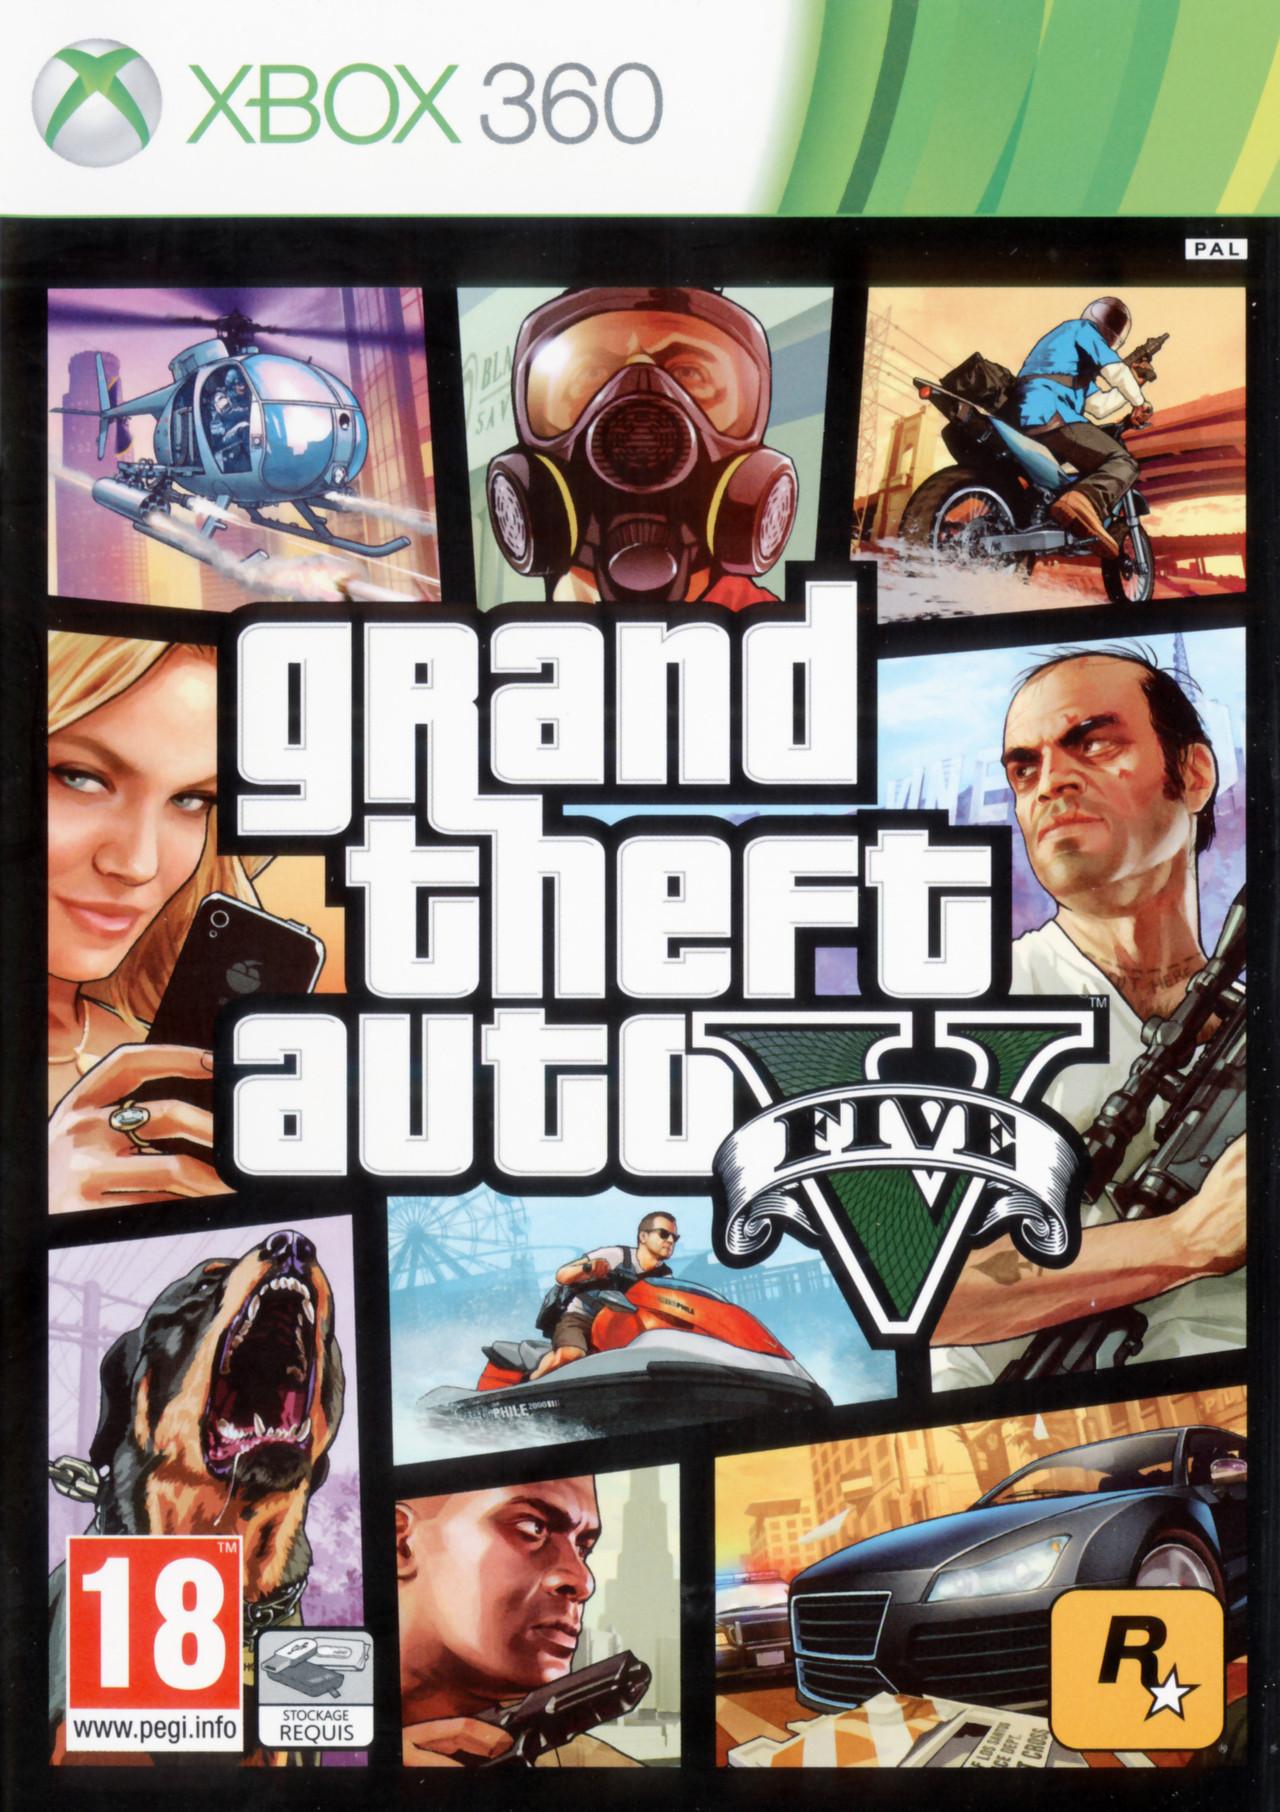 Gta 5 Xbox 360 : Gta grand theft auto sur xbox jeuxvideo